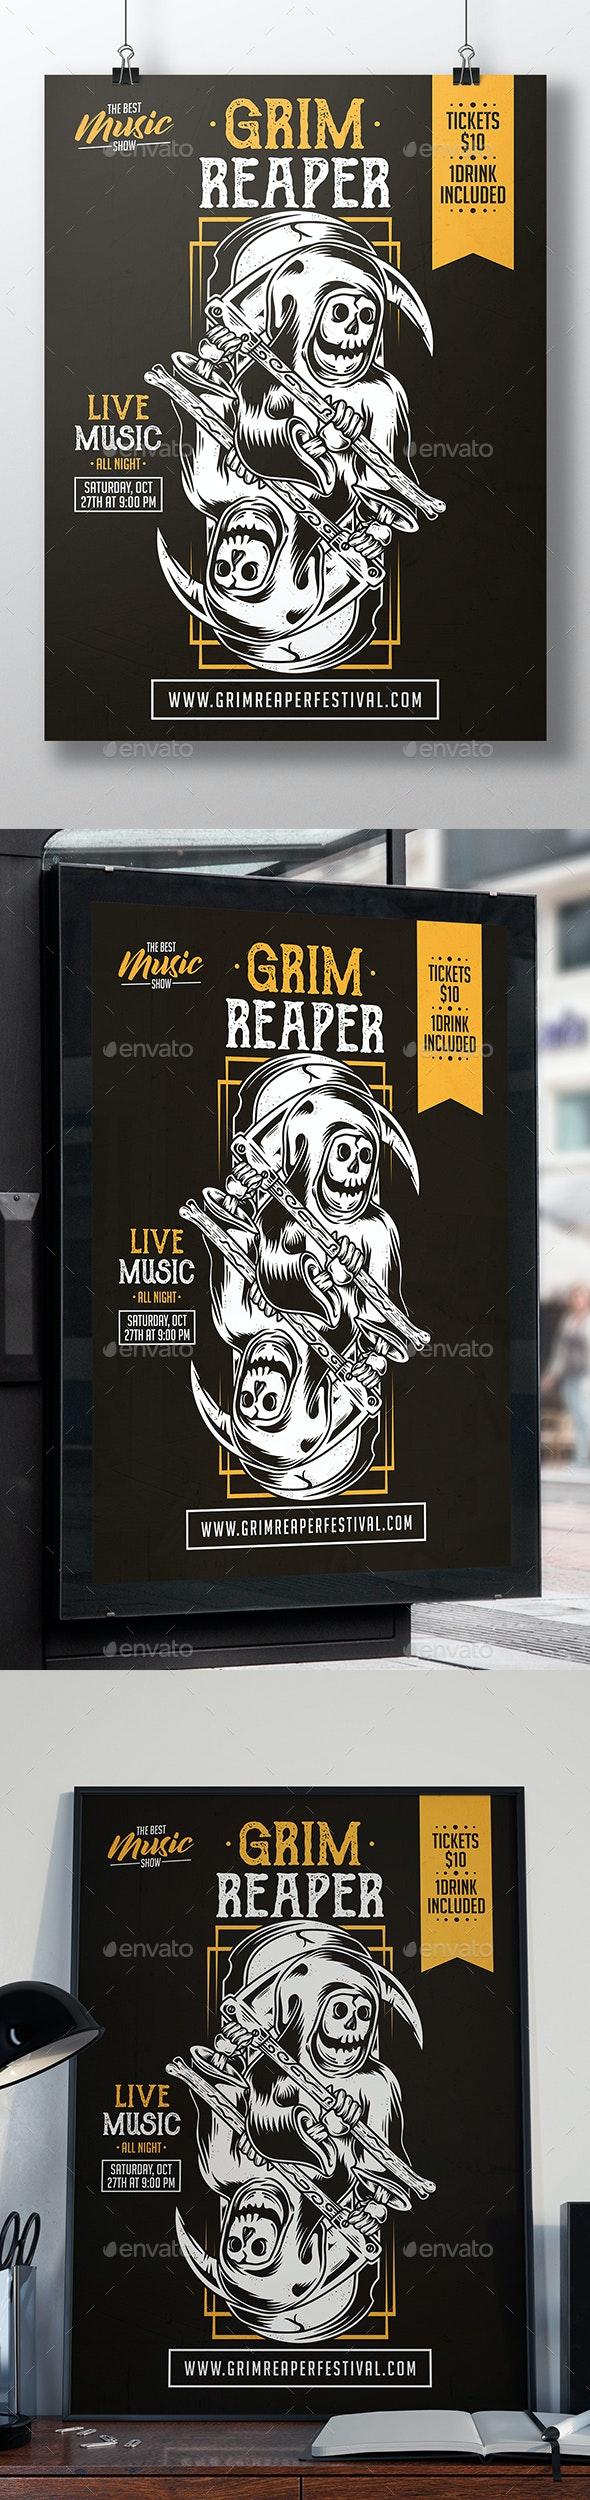 Grim Reaper Flyer Template - Concerts Events